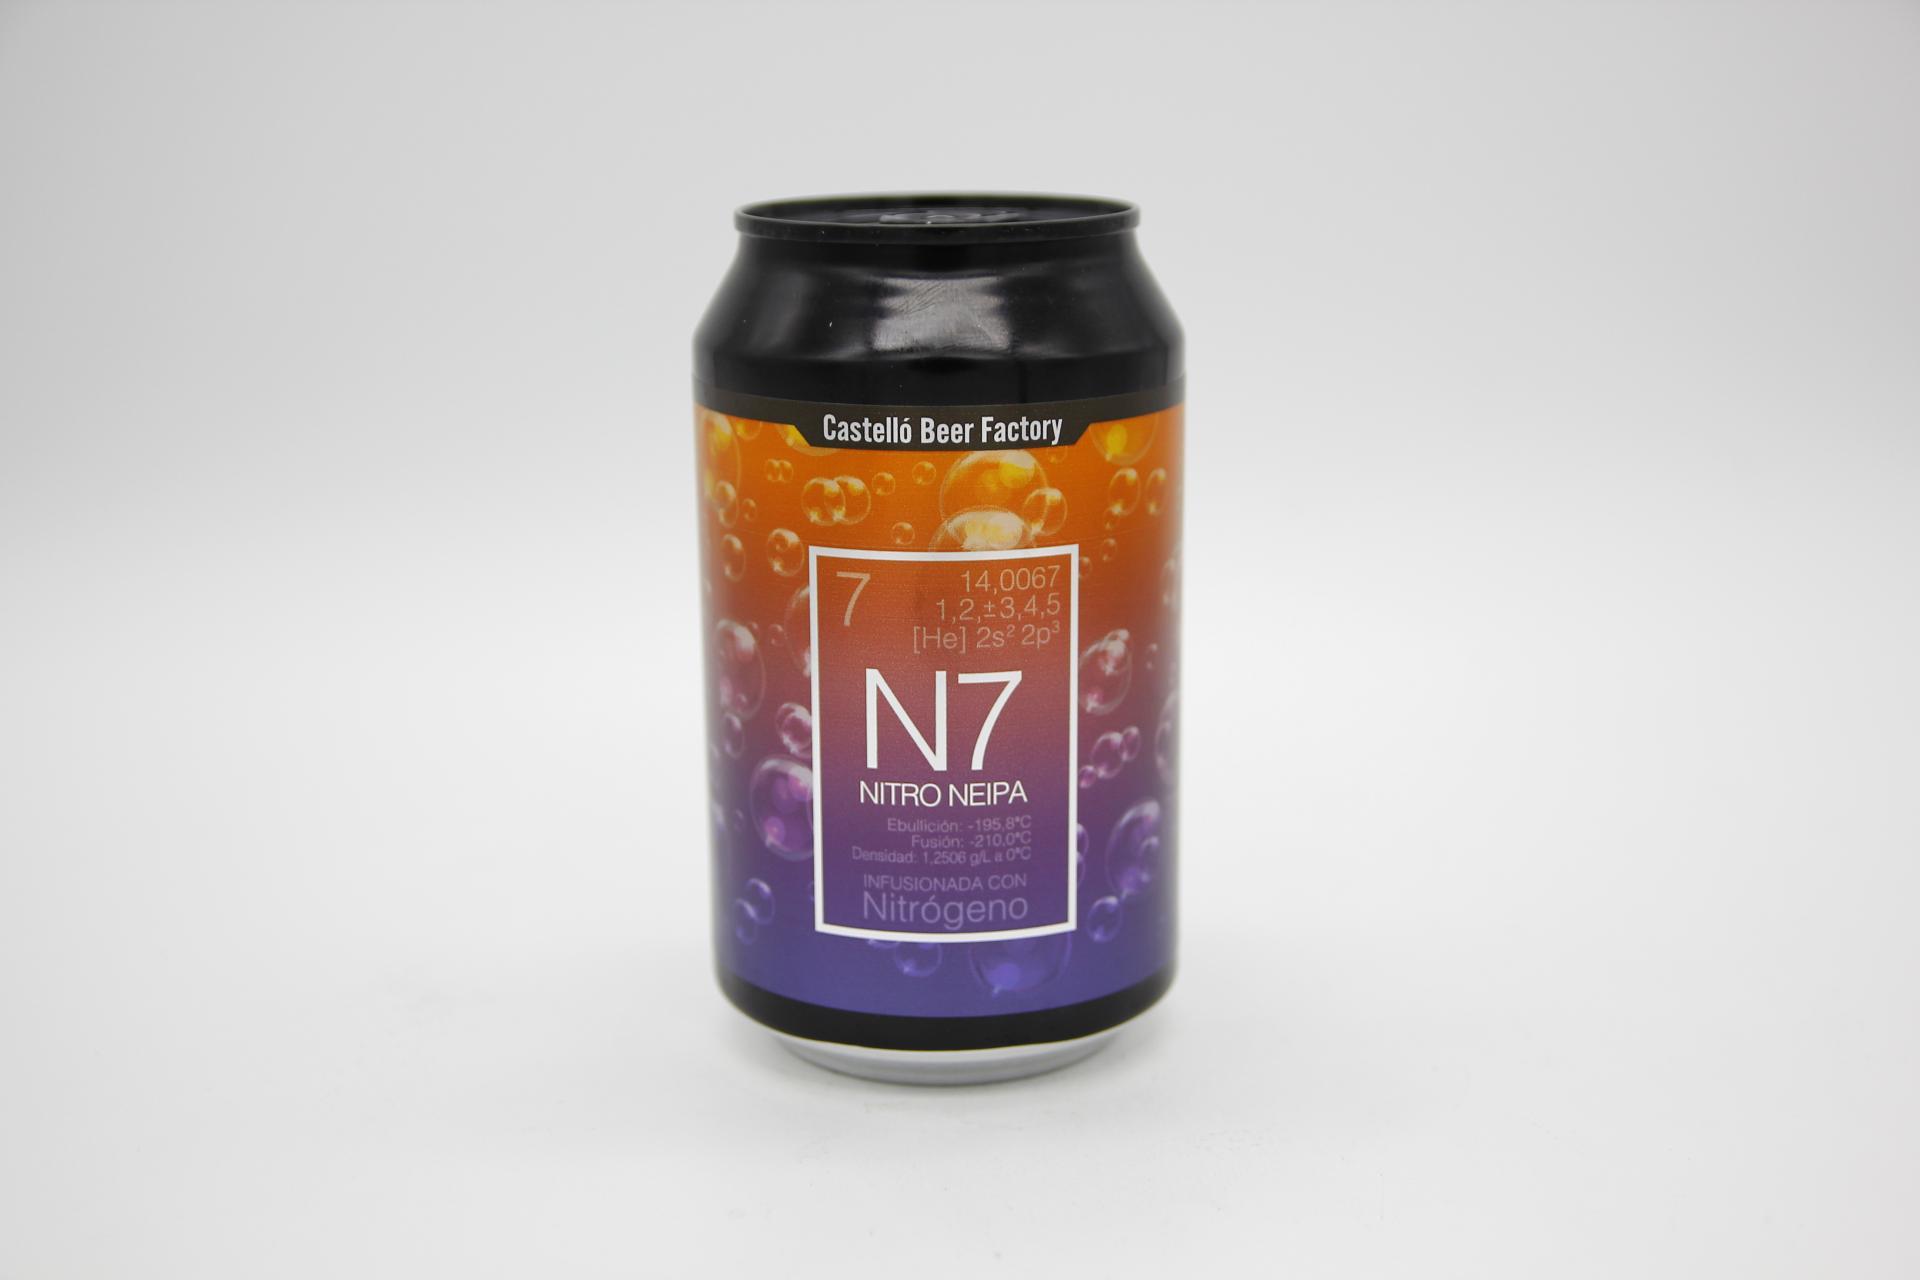 CASTELLÓ BEER FACTORY - N7 33cl